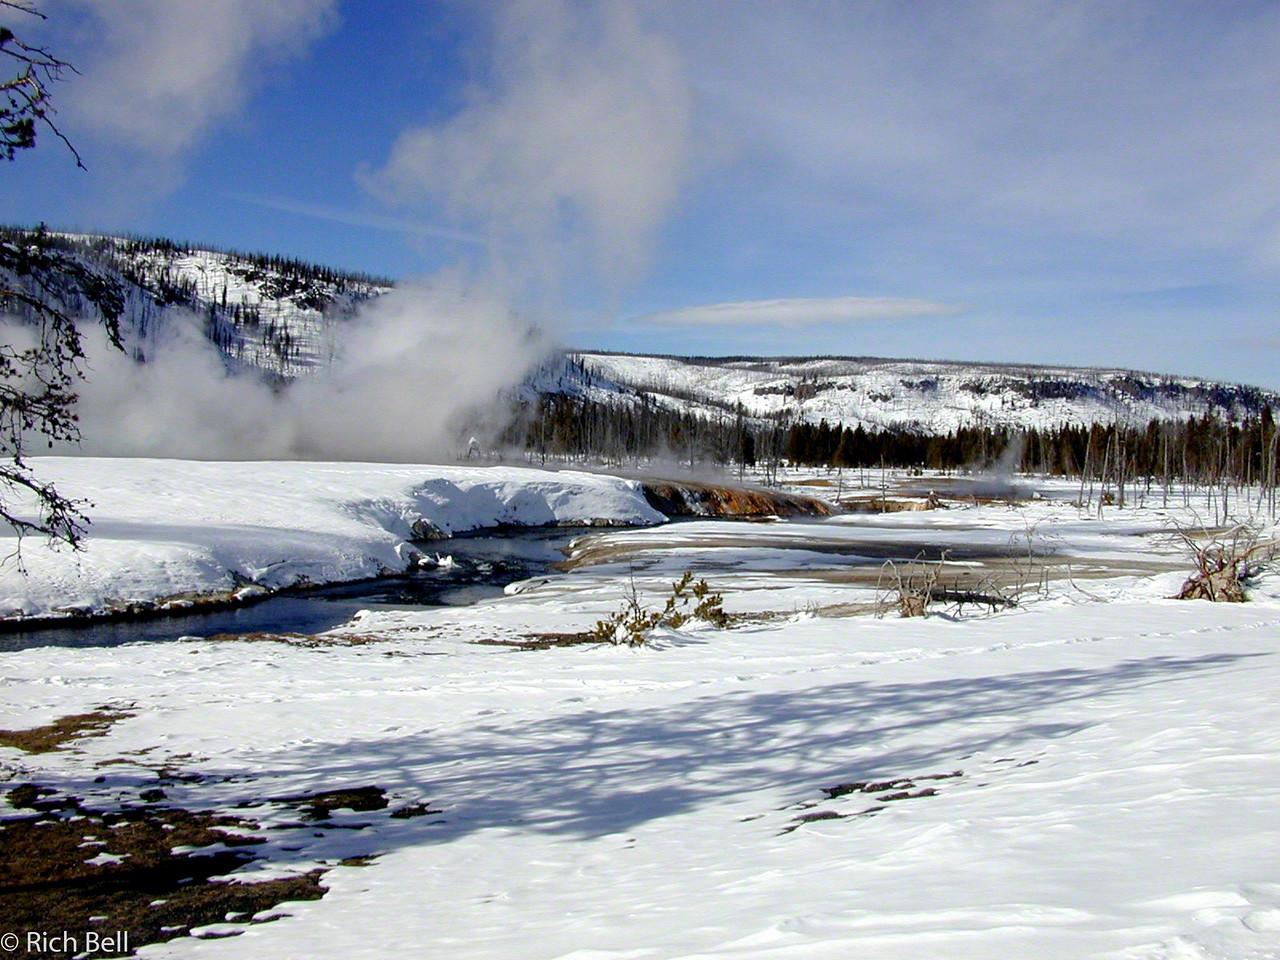 20100721Meadow near Hot Springs in Yellowstone0048